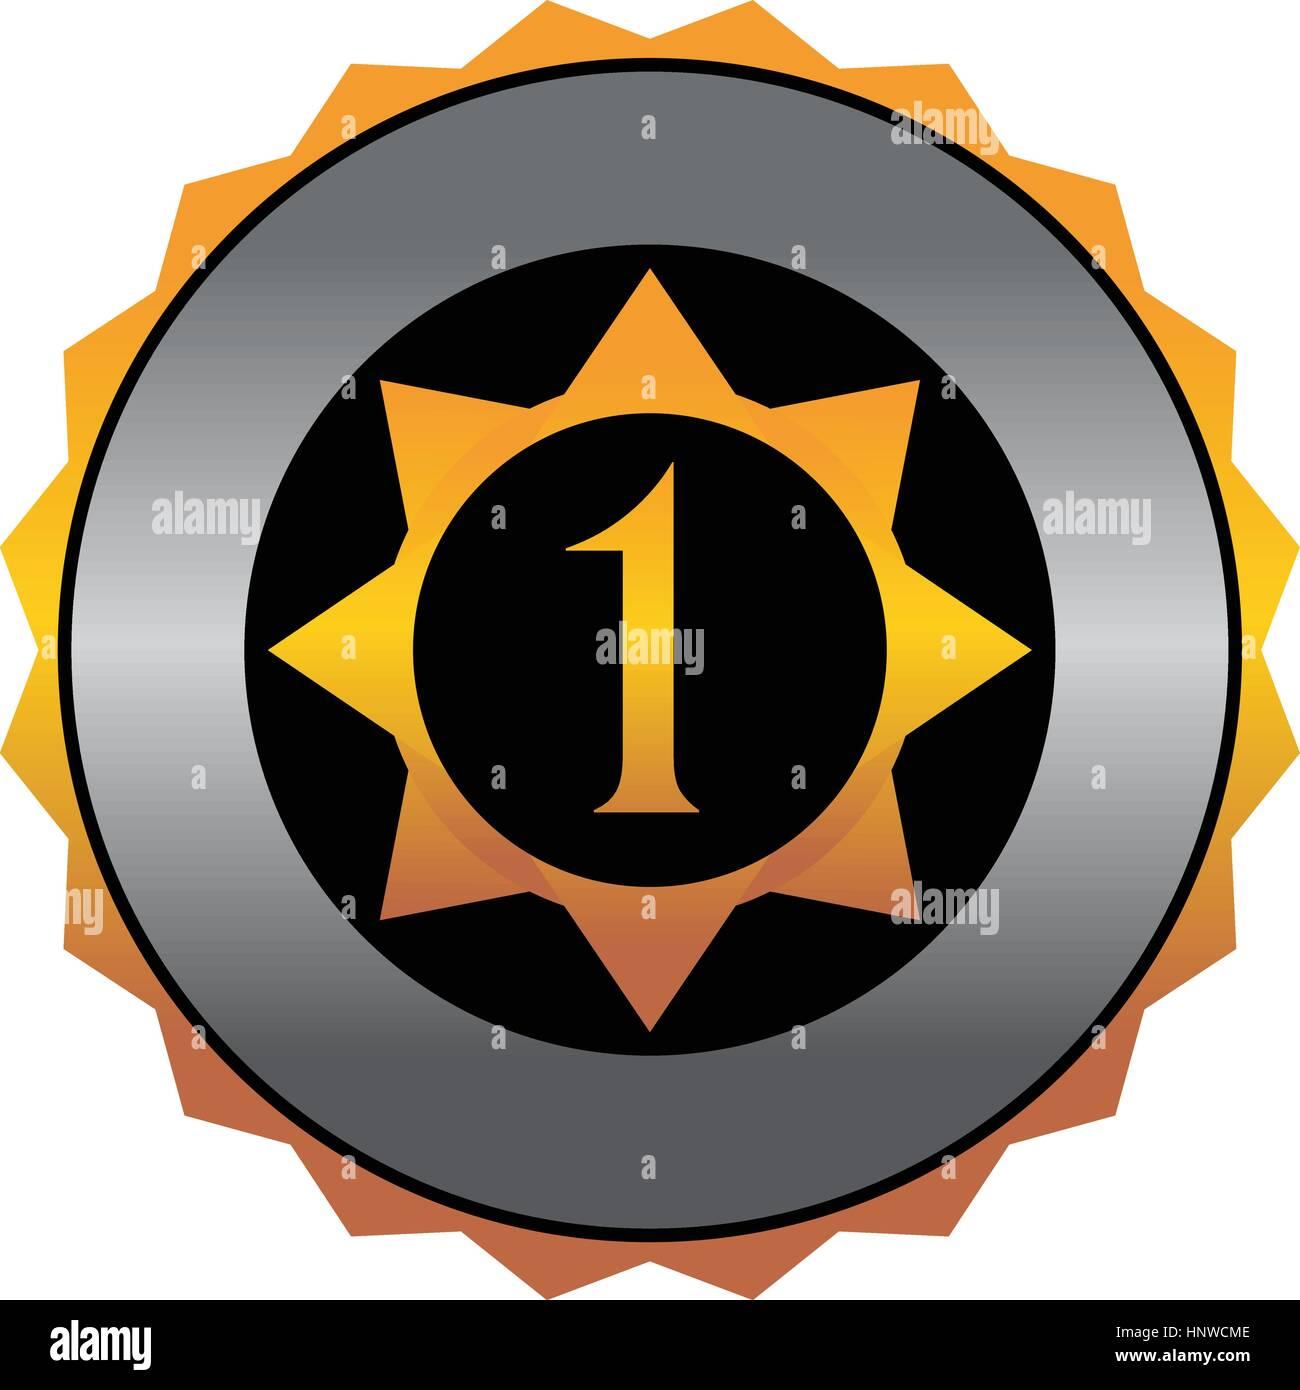 Militar medalla número 1 Imagen De Stock